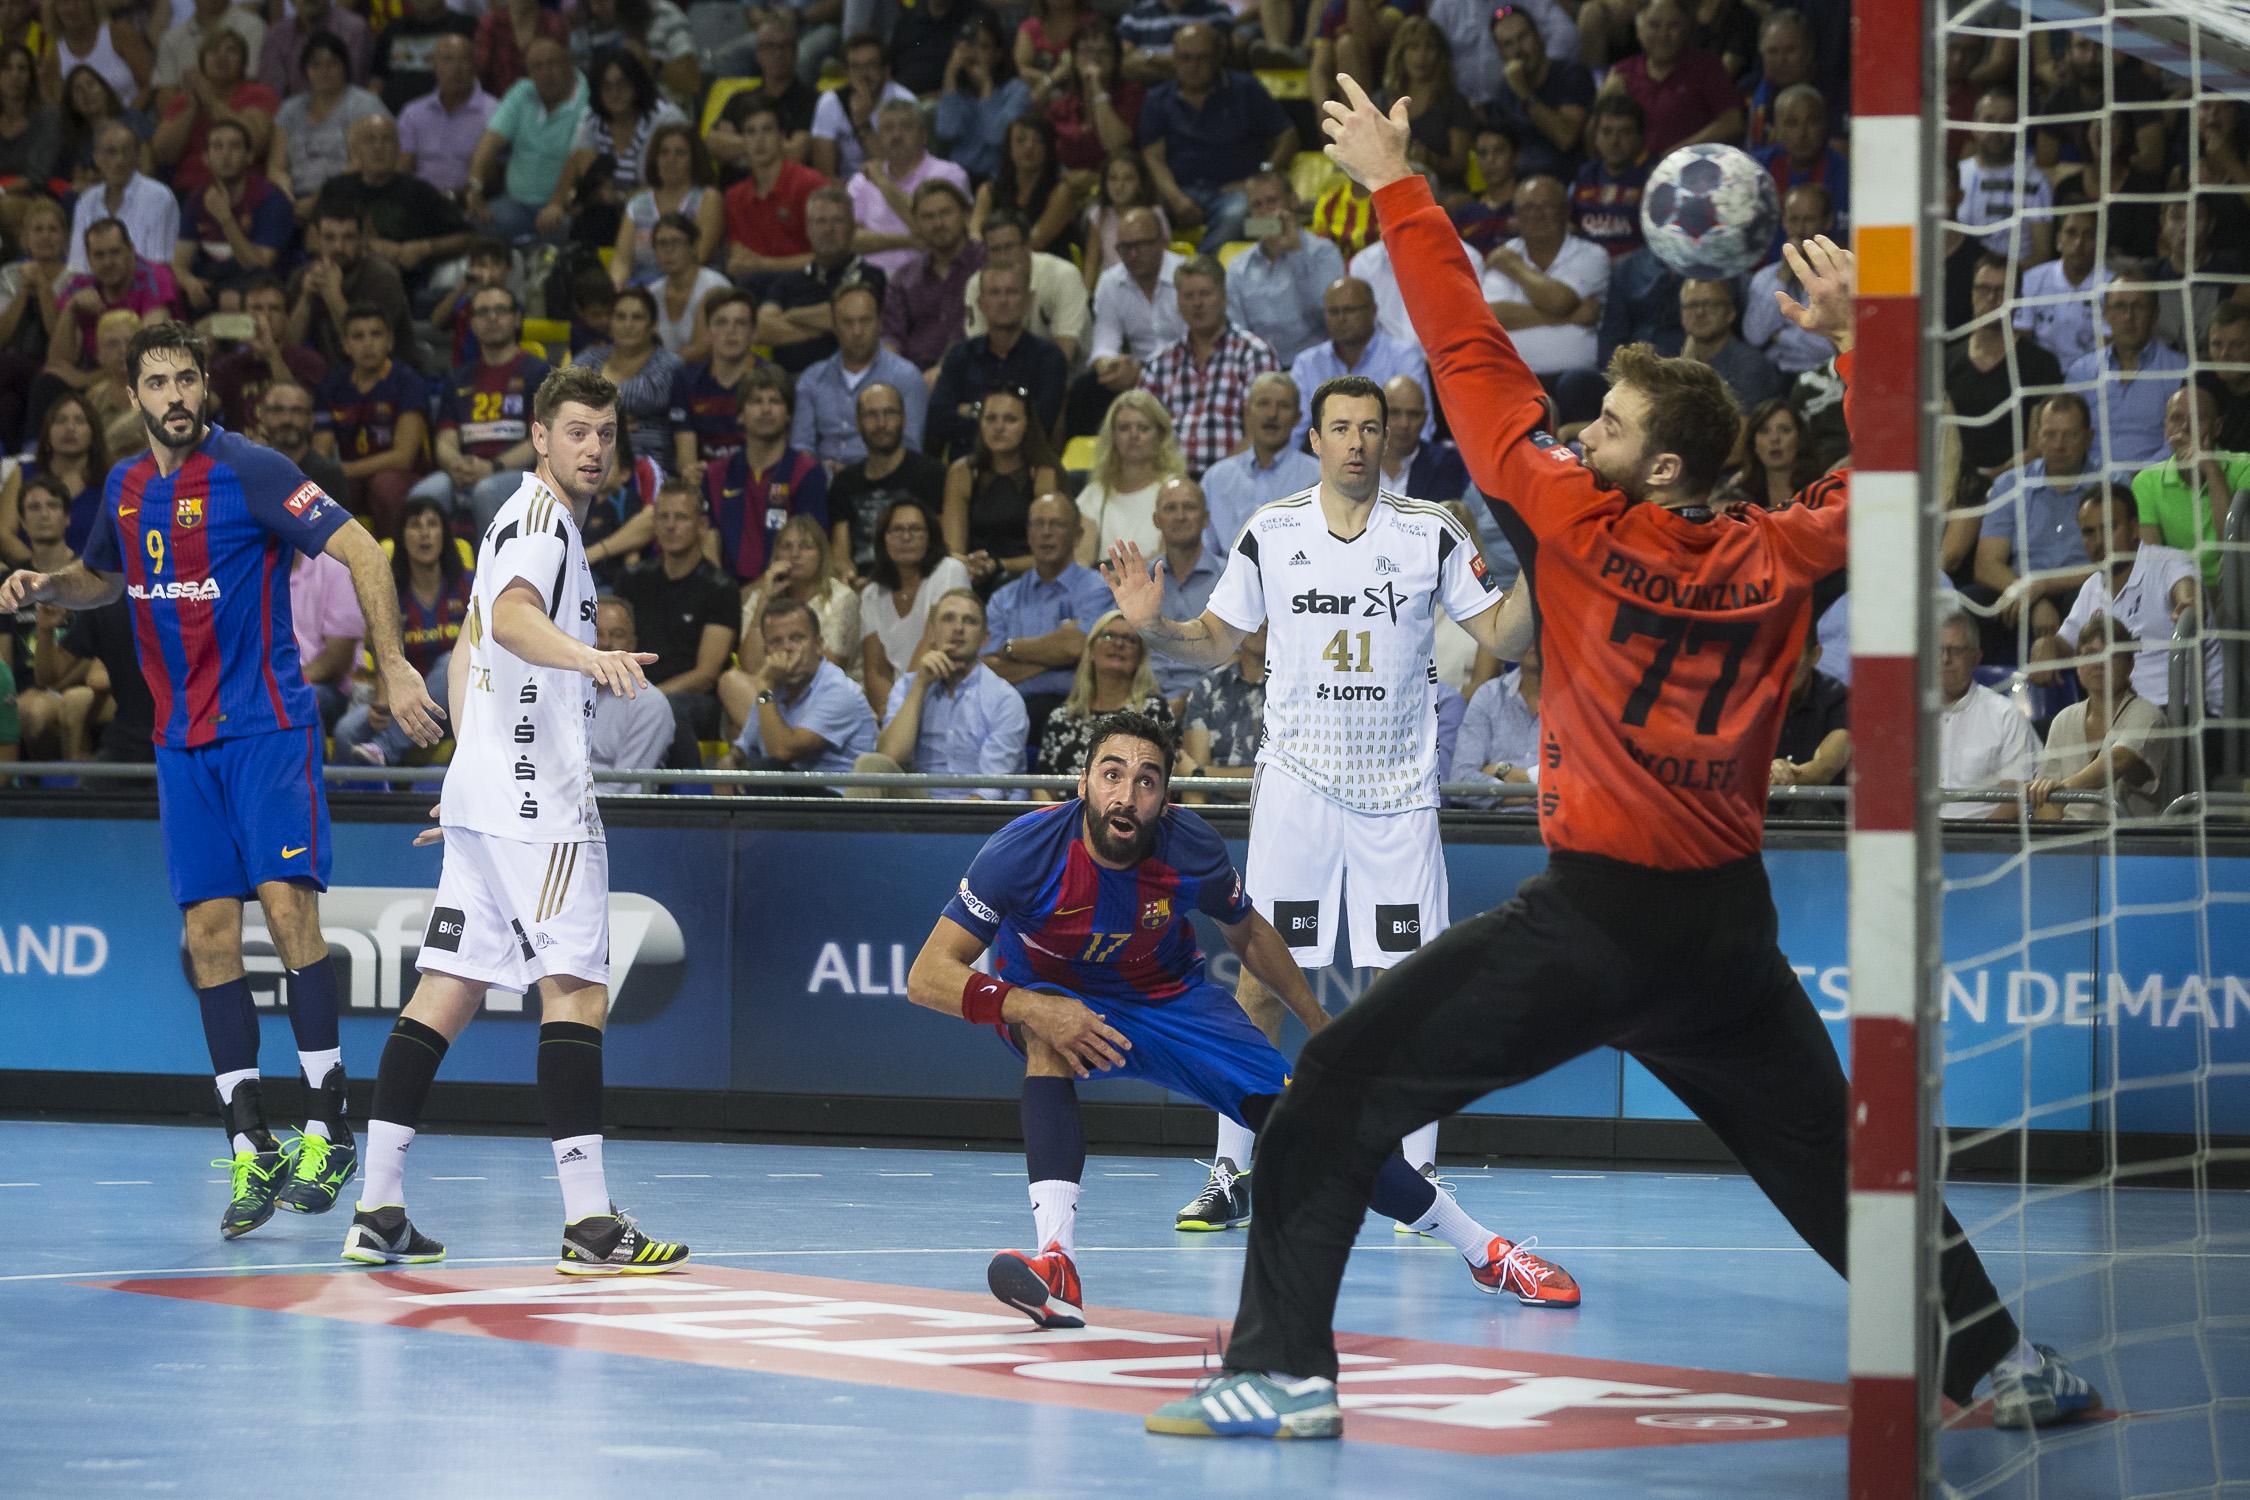 portfolio20161001-handball-cl-barca-thw-kiel-892-bc3t0161